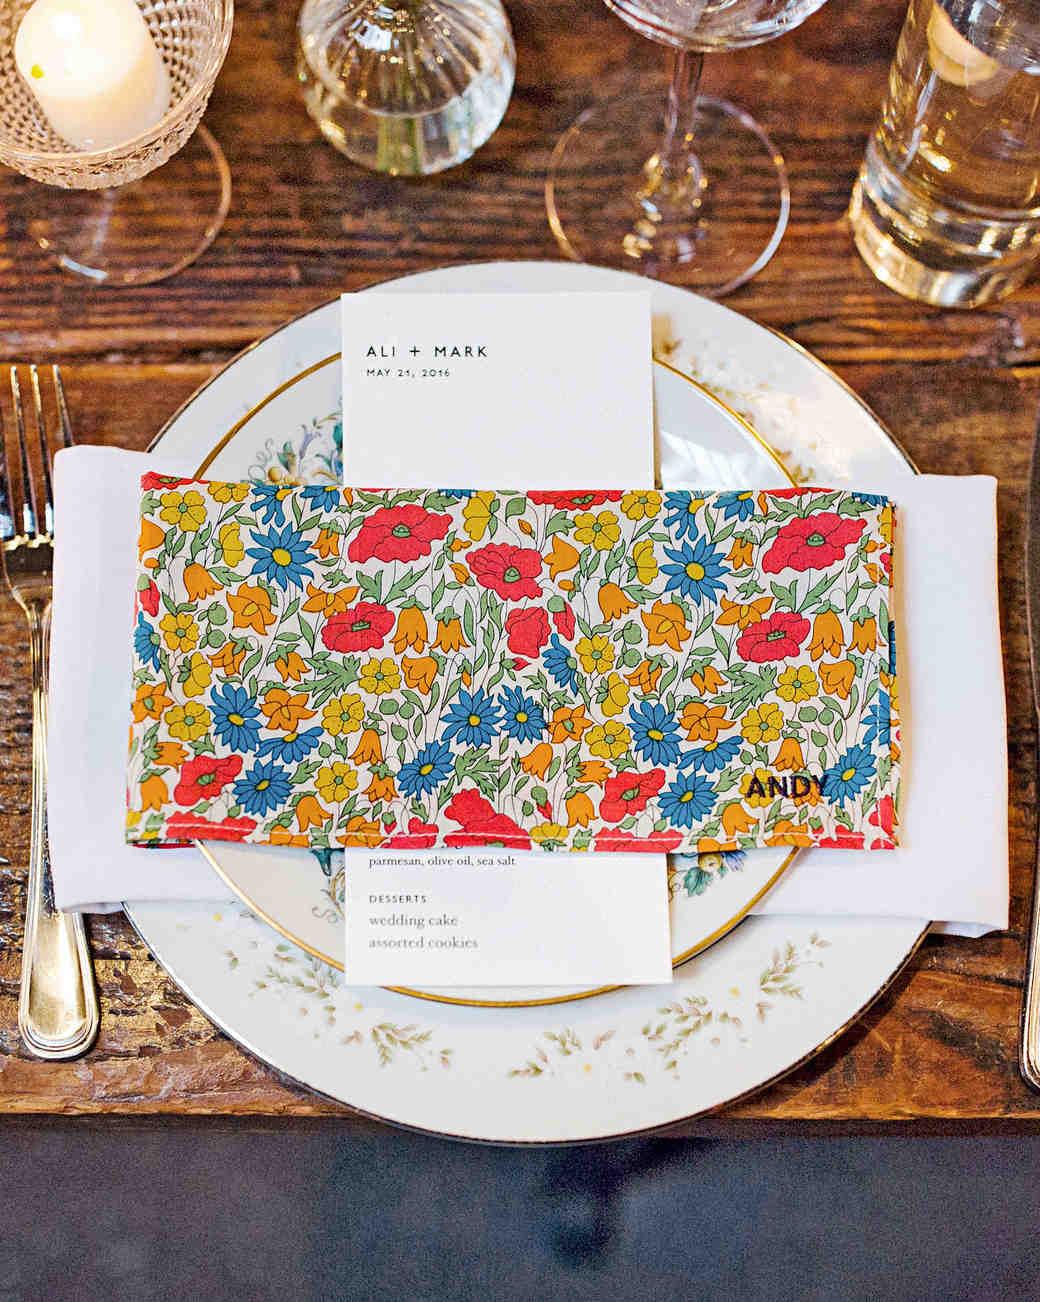 ali mark wedding new york napkins placecards